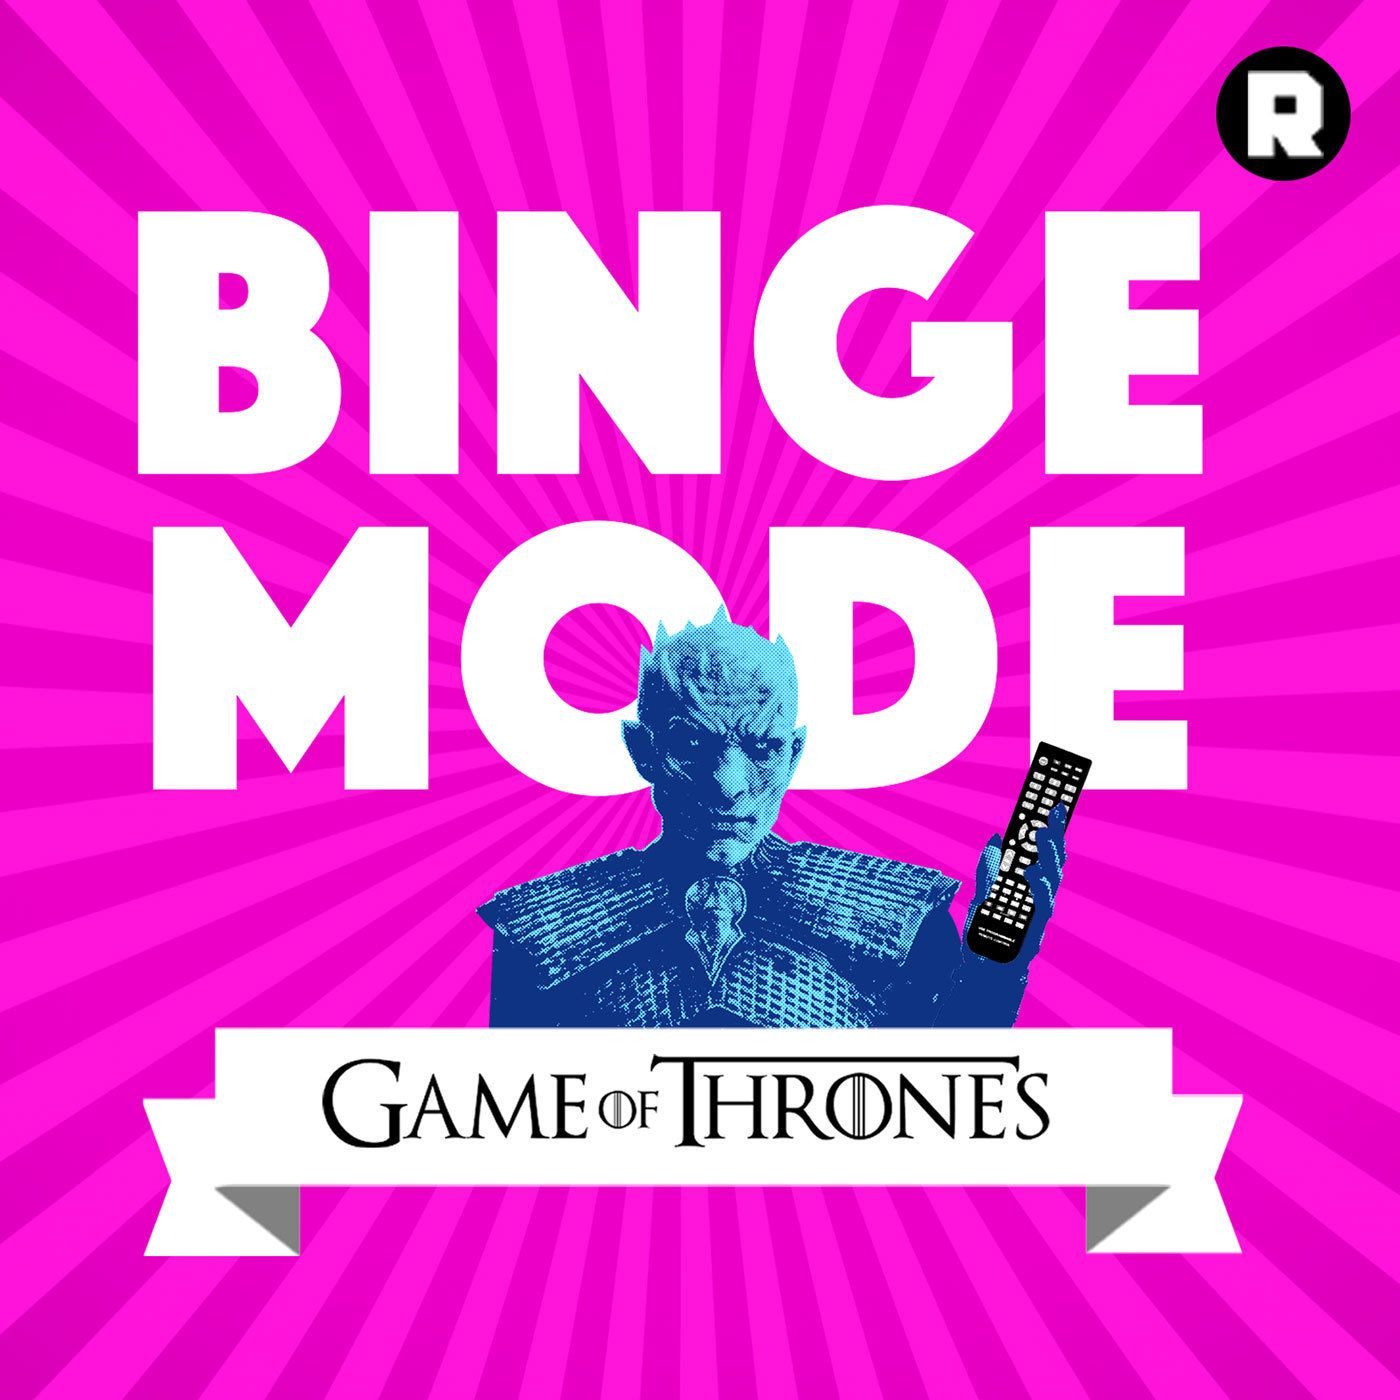 S2E10: Valar Morghulis | Game of Thrones